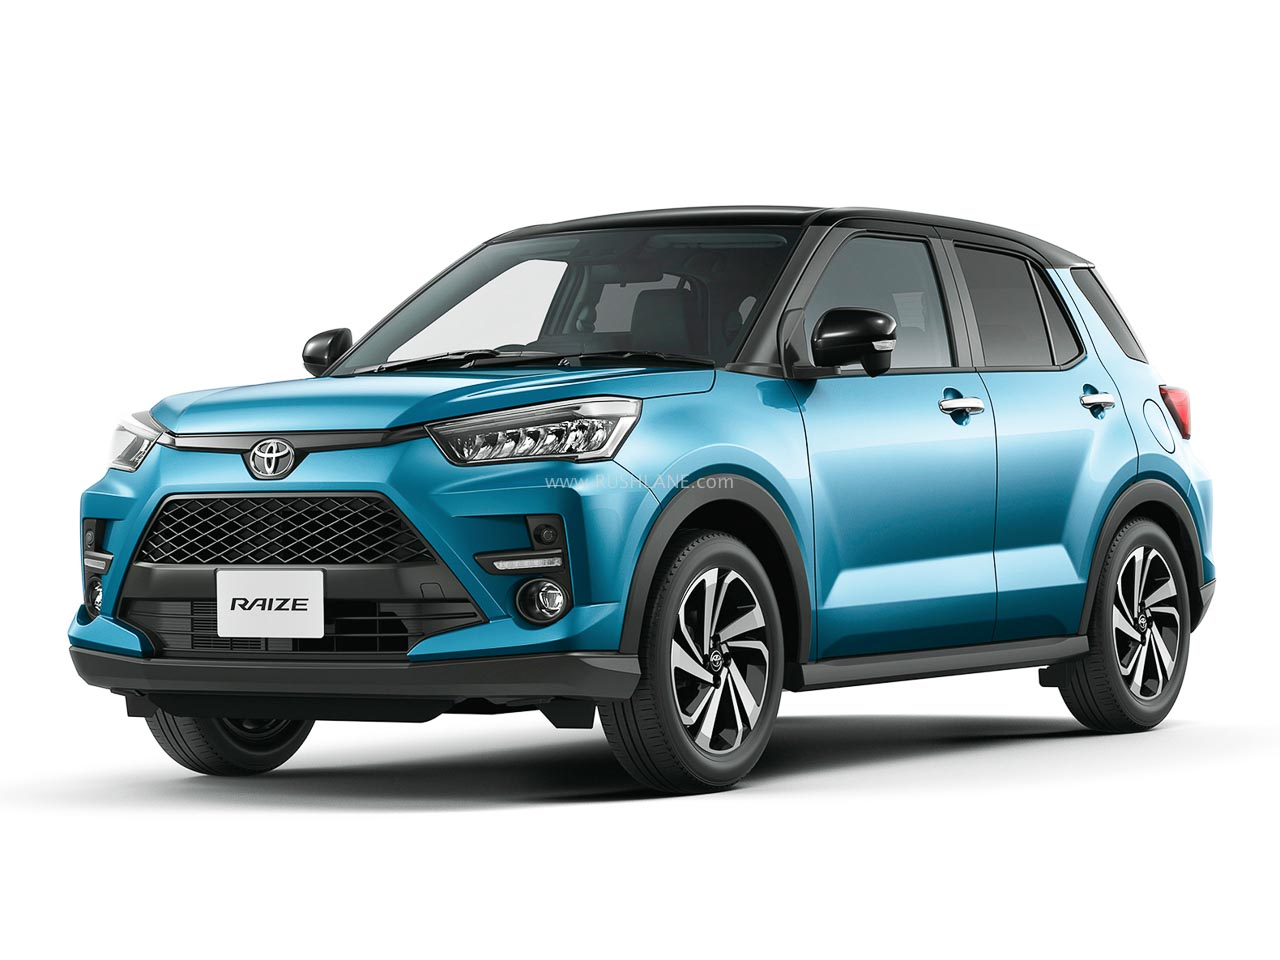 Daihatsu Rocky joins Nexon, XUV300 in sub 4m SUV club with 5 star safety